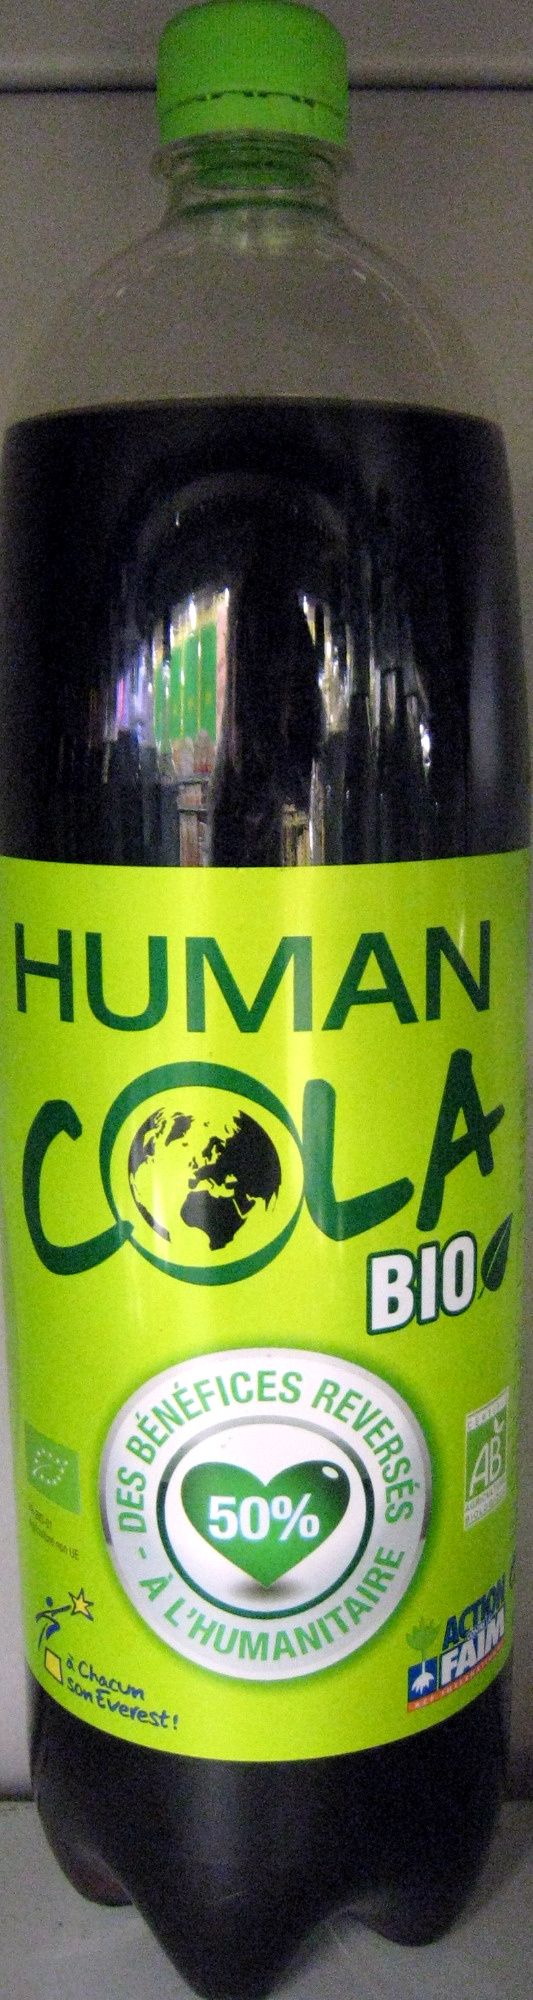 Human Cola Bio - Prodotto - fr